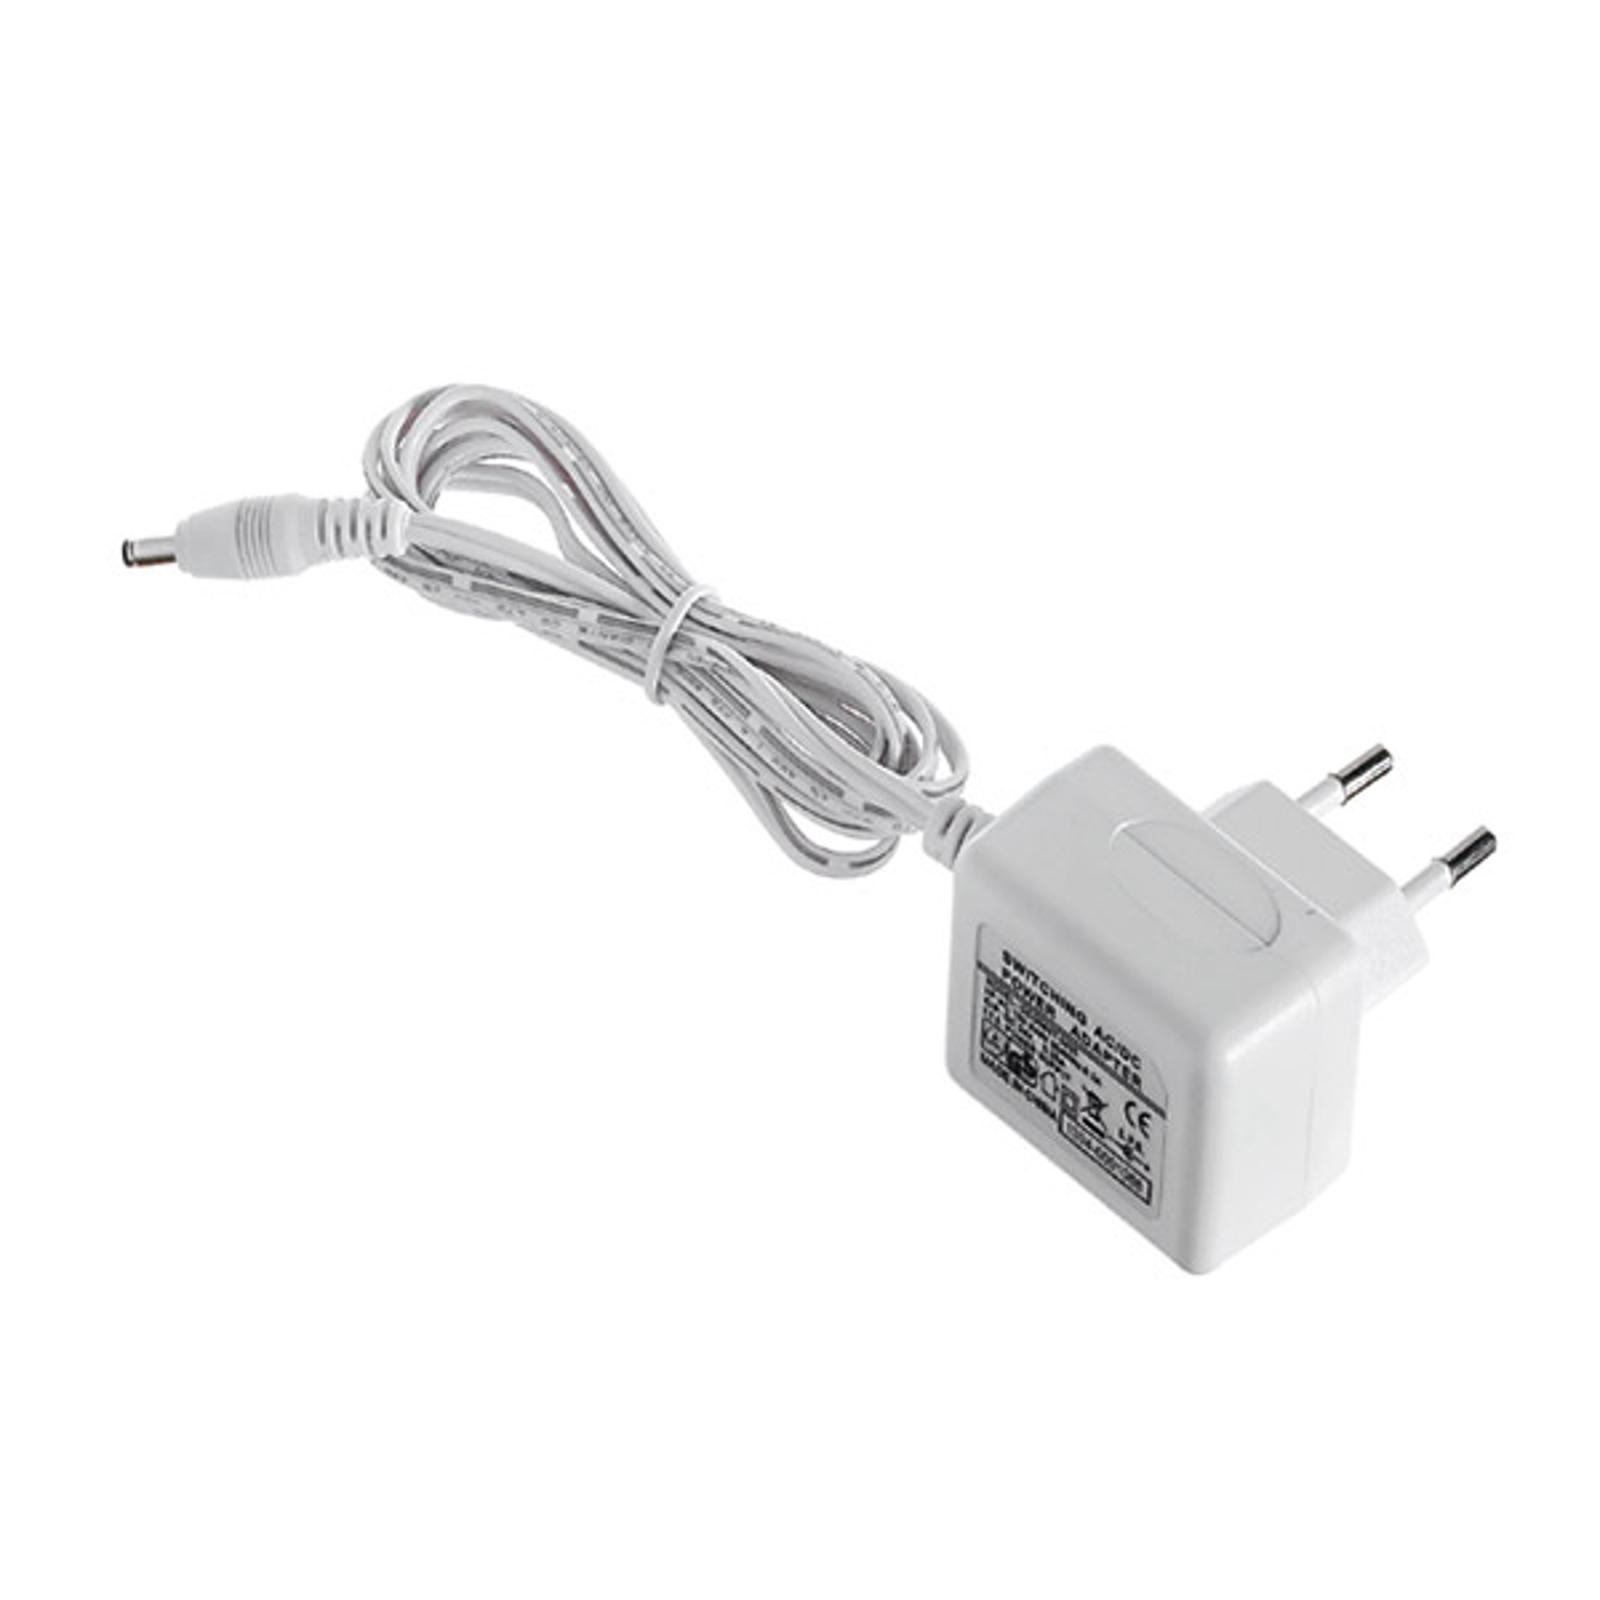 LED ovladač 6W, 24V pro Fabas Luce Galway 6690